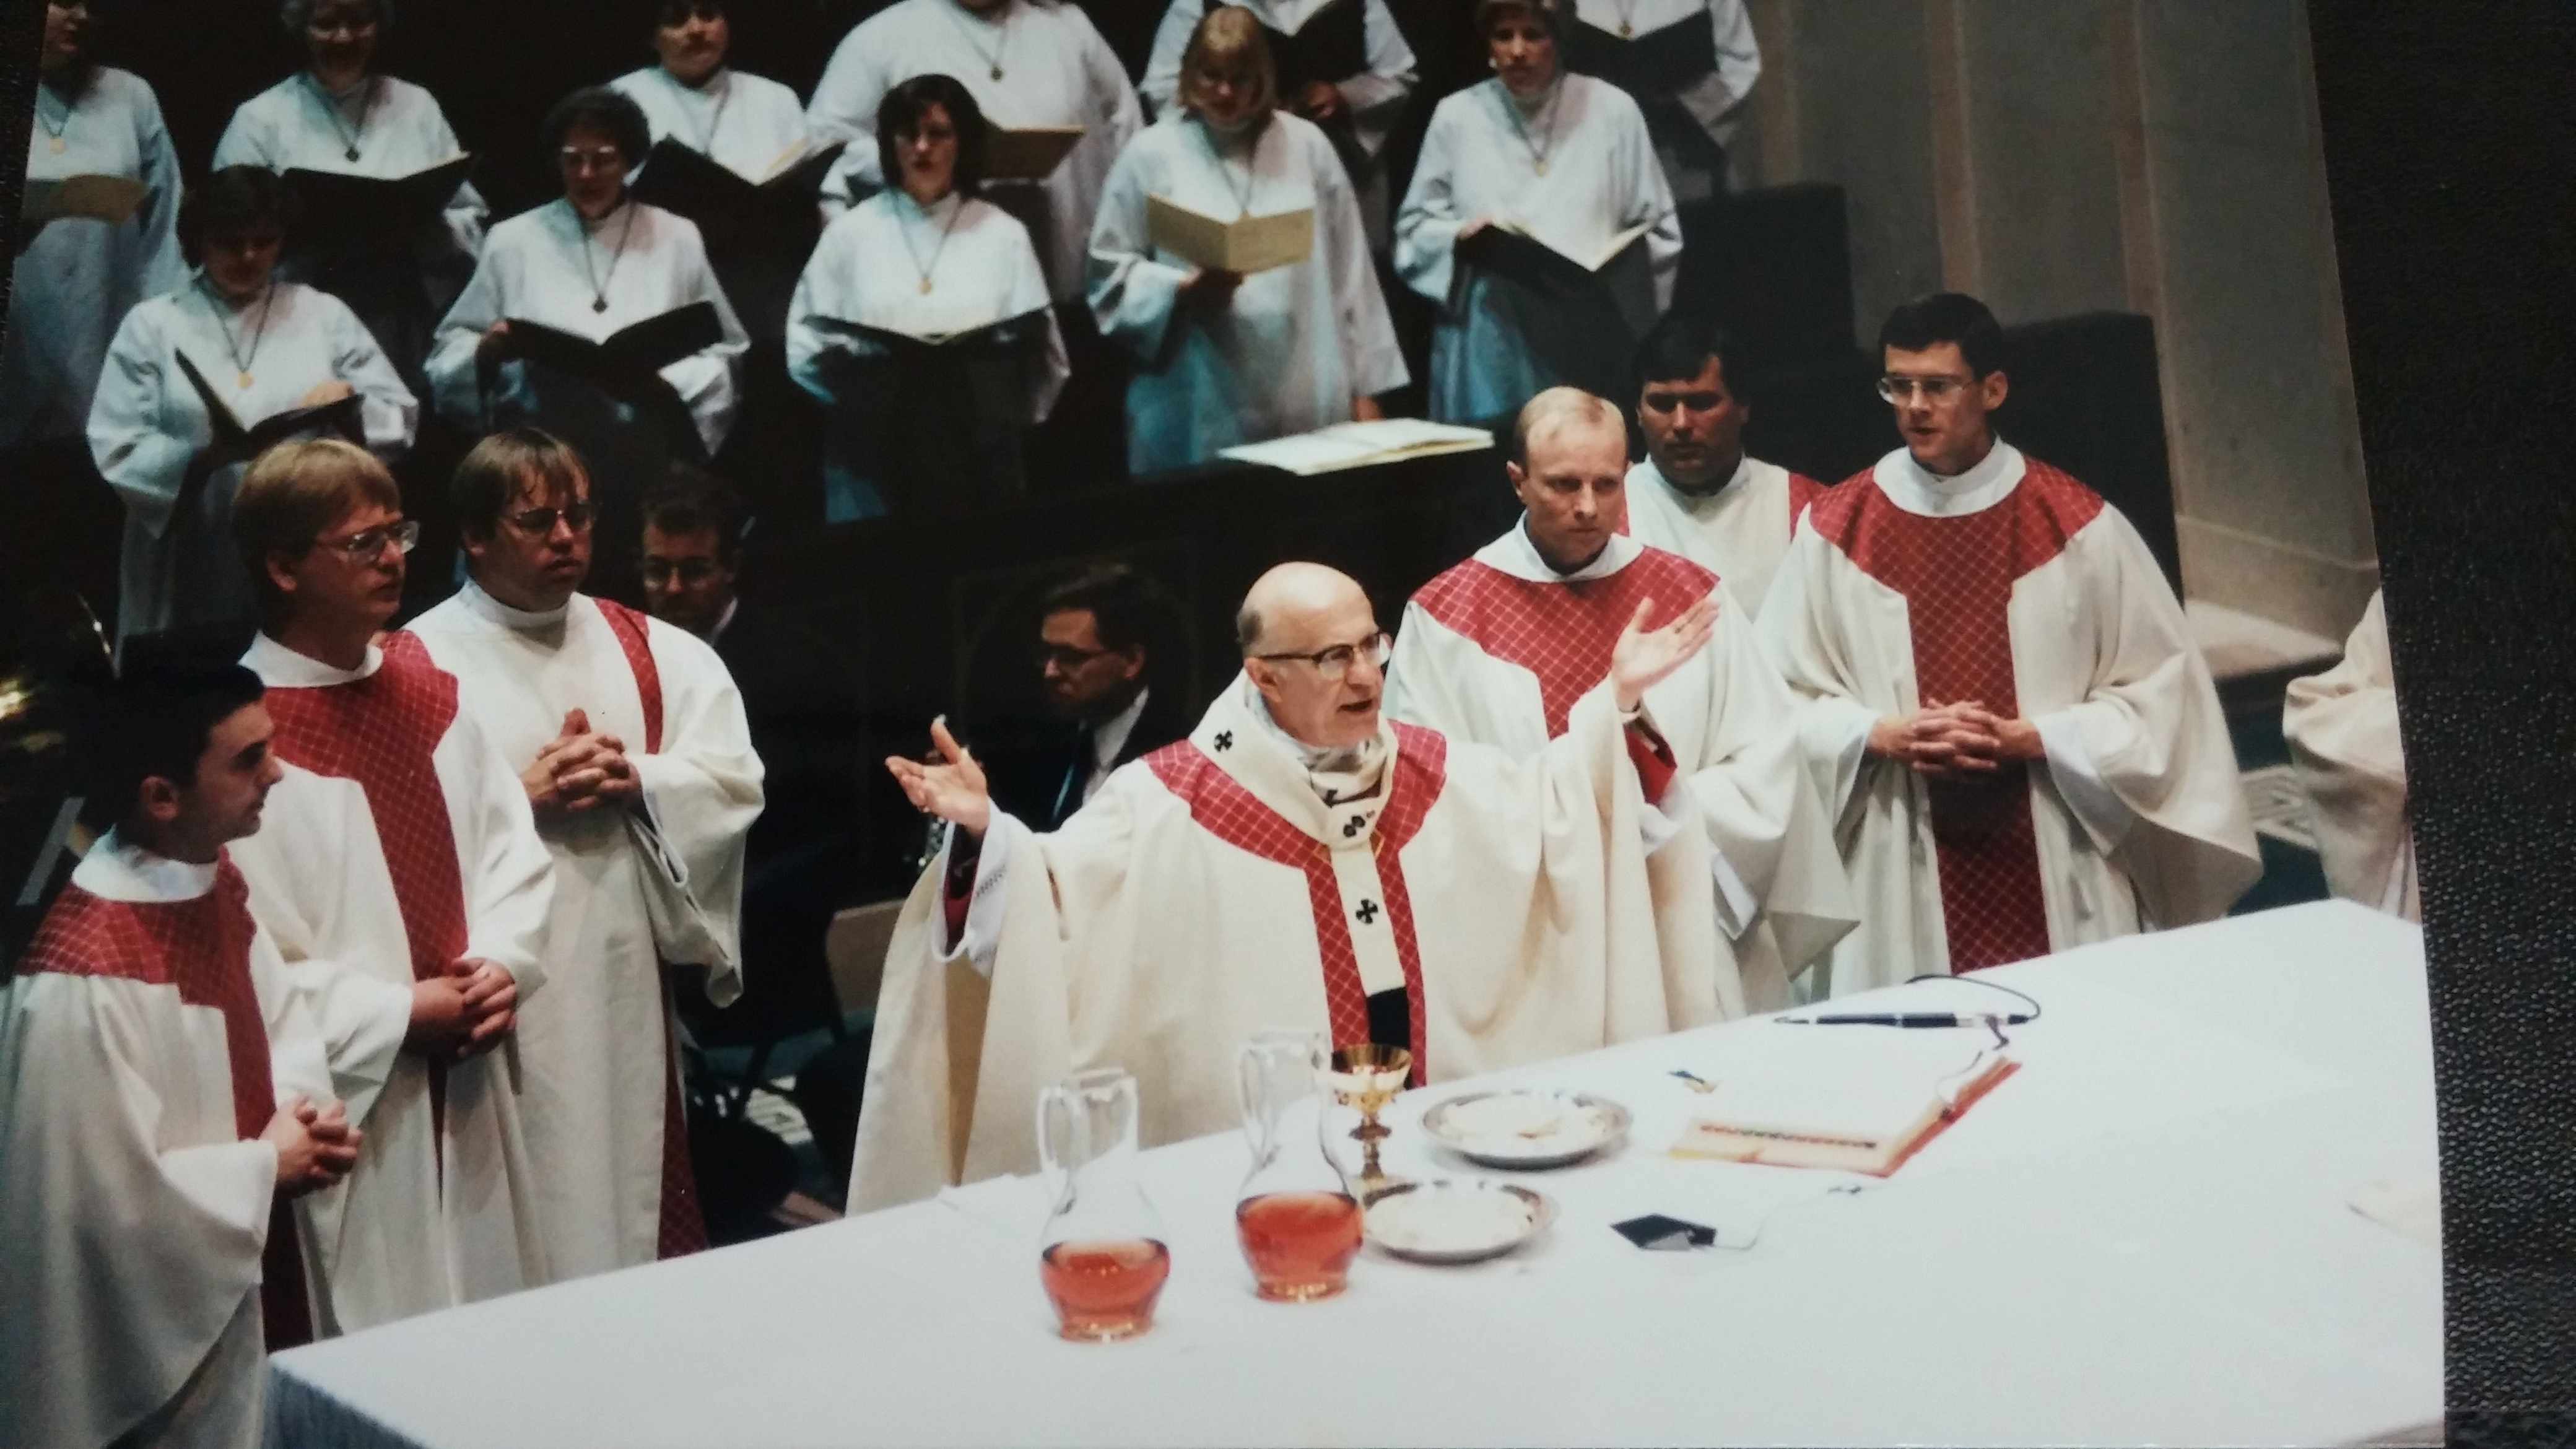 Archbishop Pilarczyk Eucharistic Prayer.